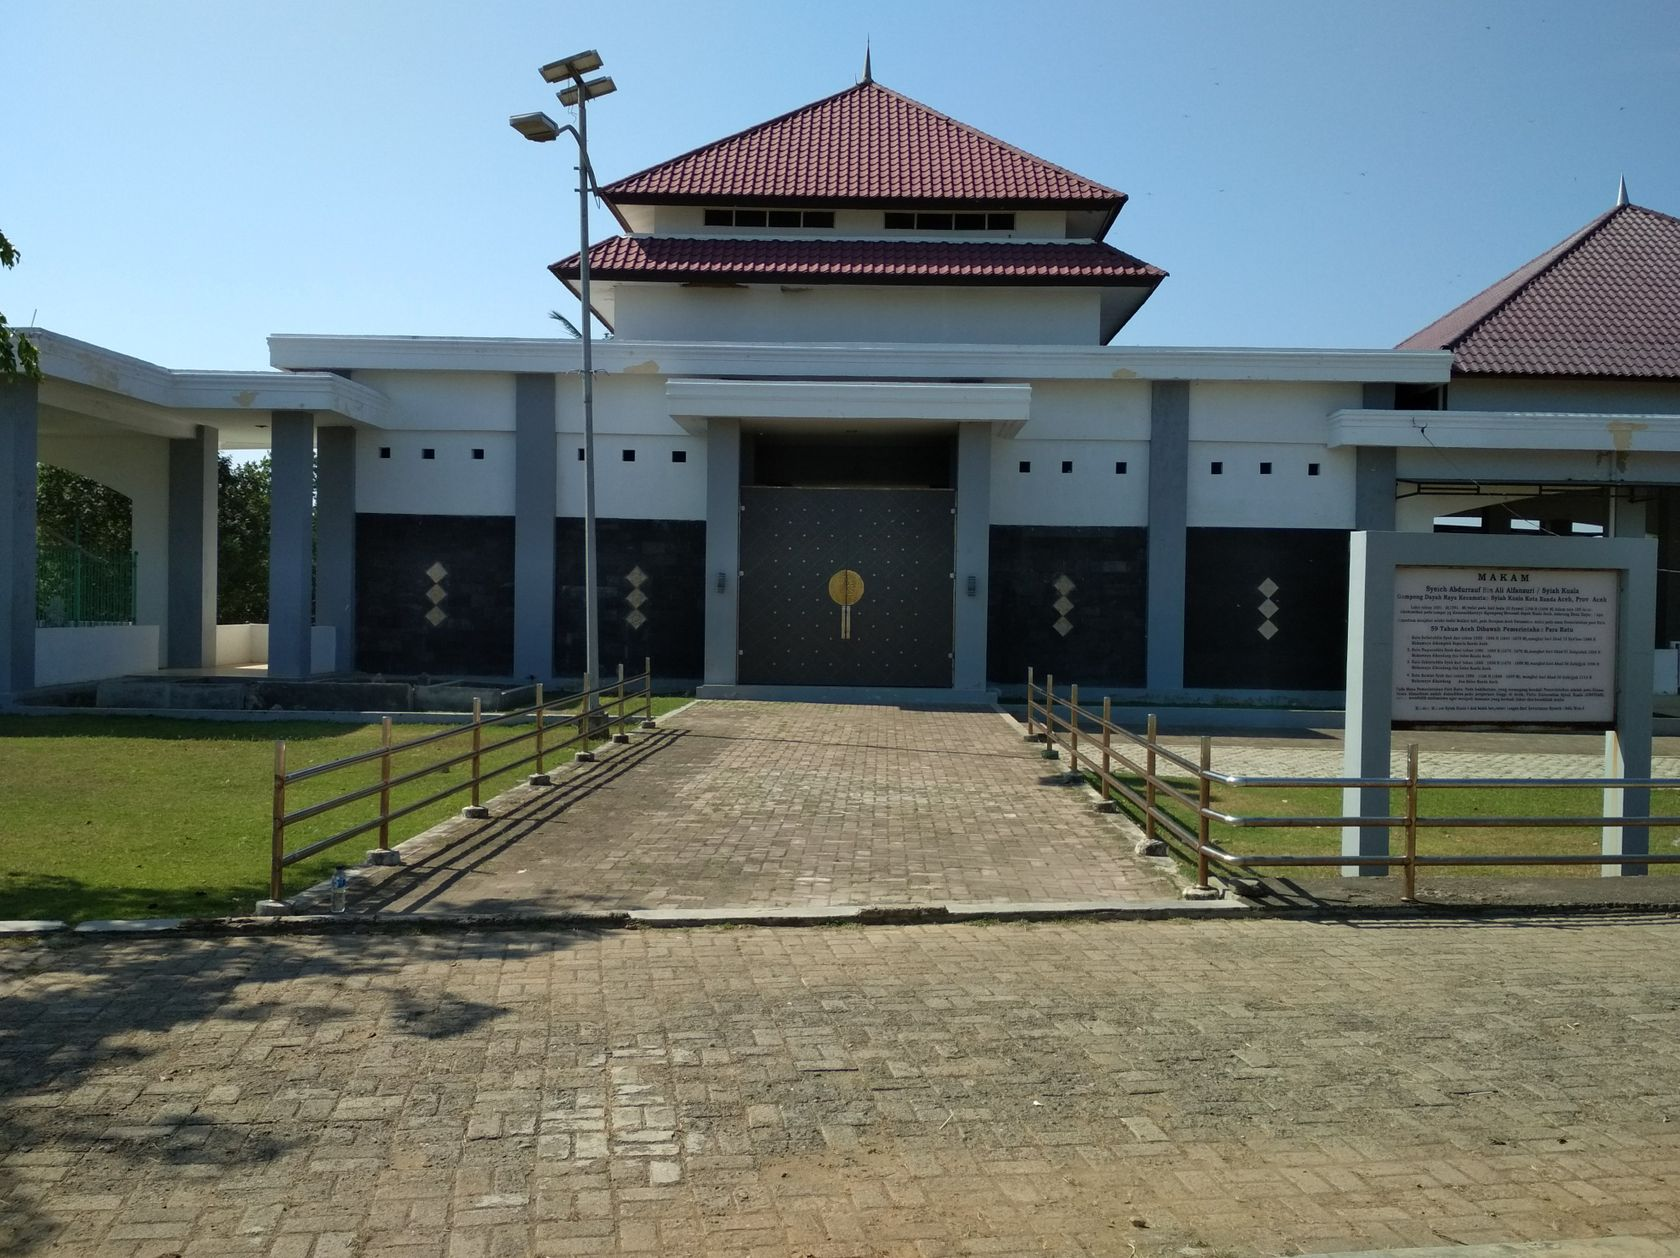 Berkunjung Makam Syiah Kuala Steemit Img 20180208 200053 Jpg Kota